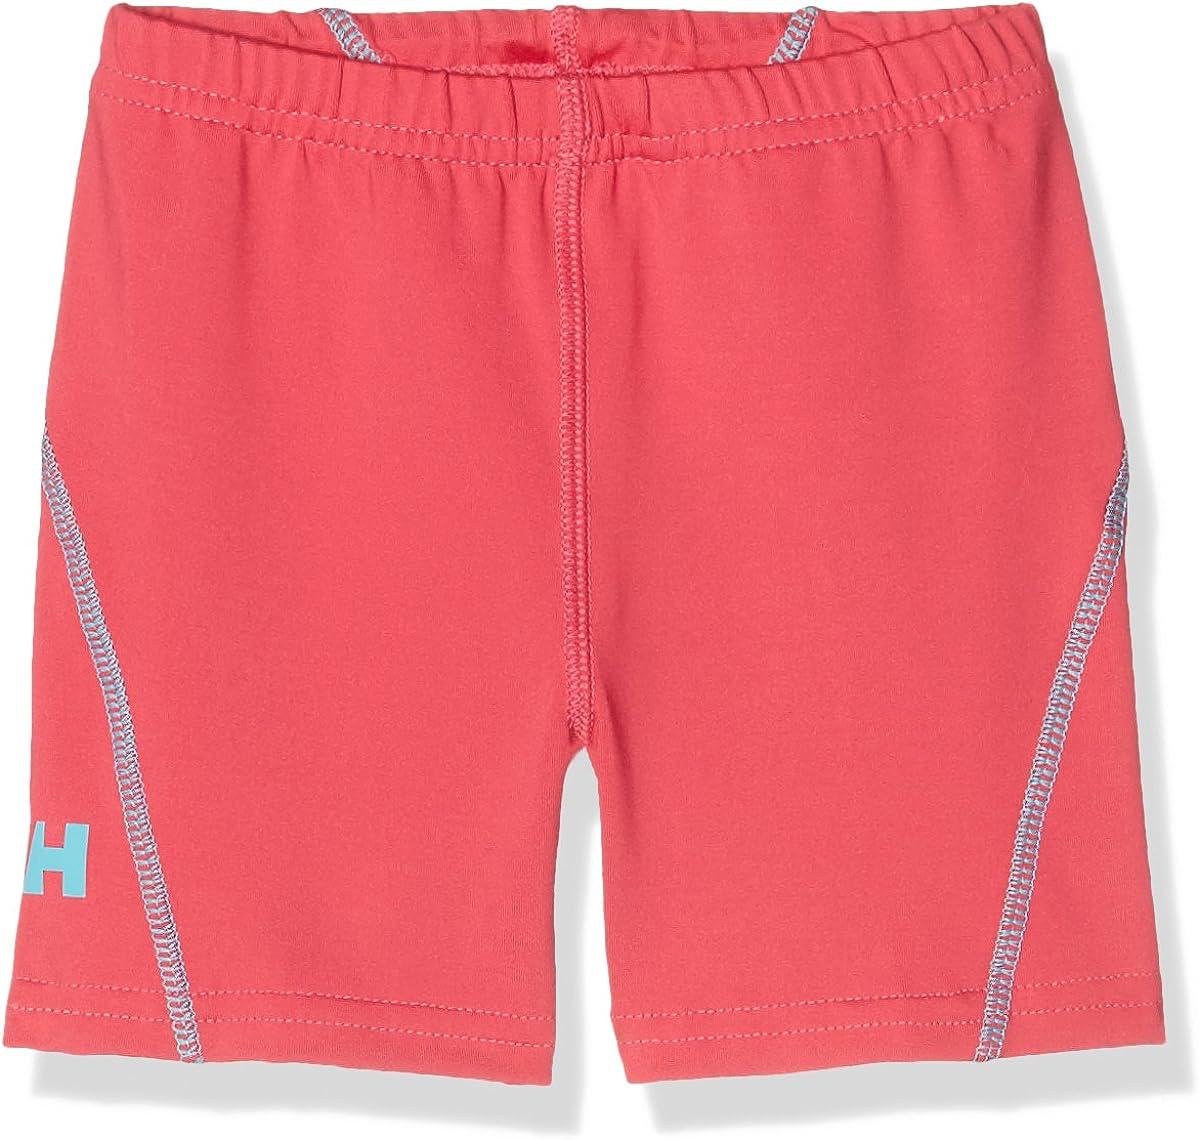 Unisex ni/ños Helly Hansen K Summerfun UV Shorts Pantal/ón Corto